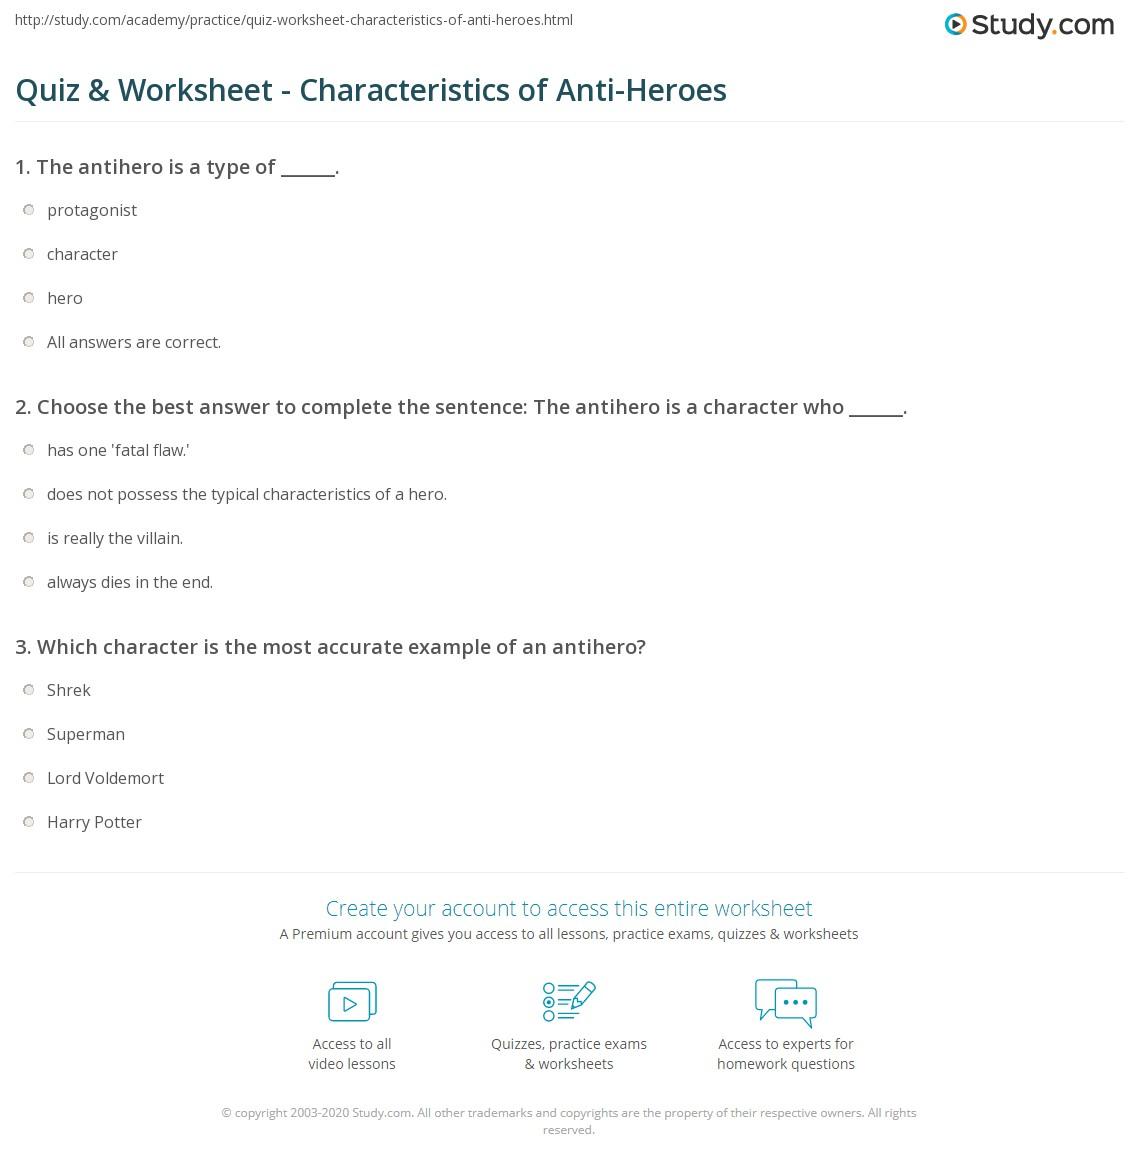 Quiz Worksheet Characteristics Of Anti Heroes Study